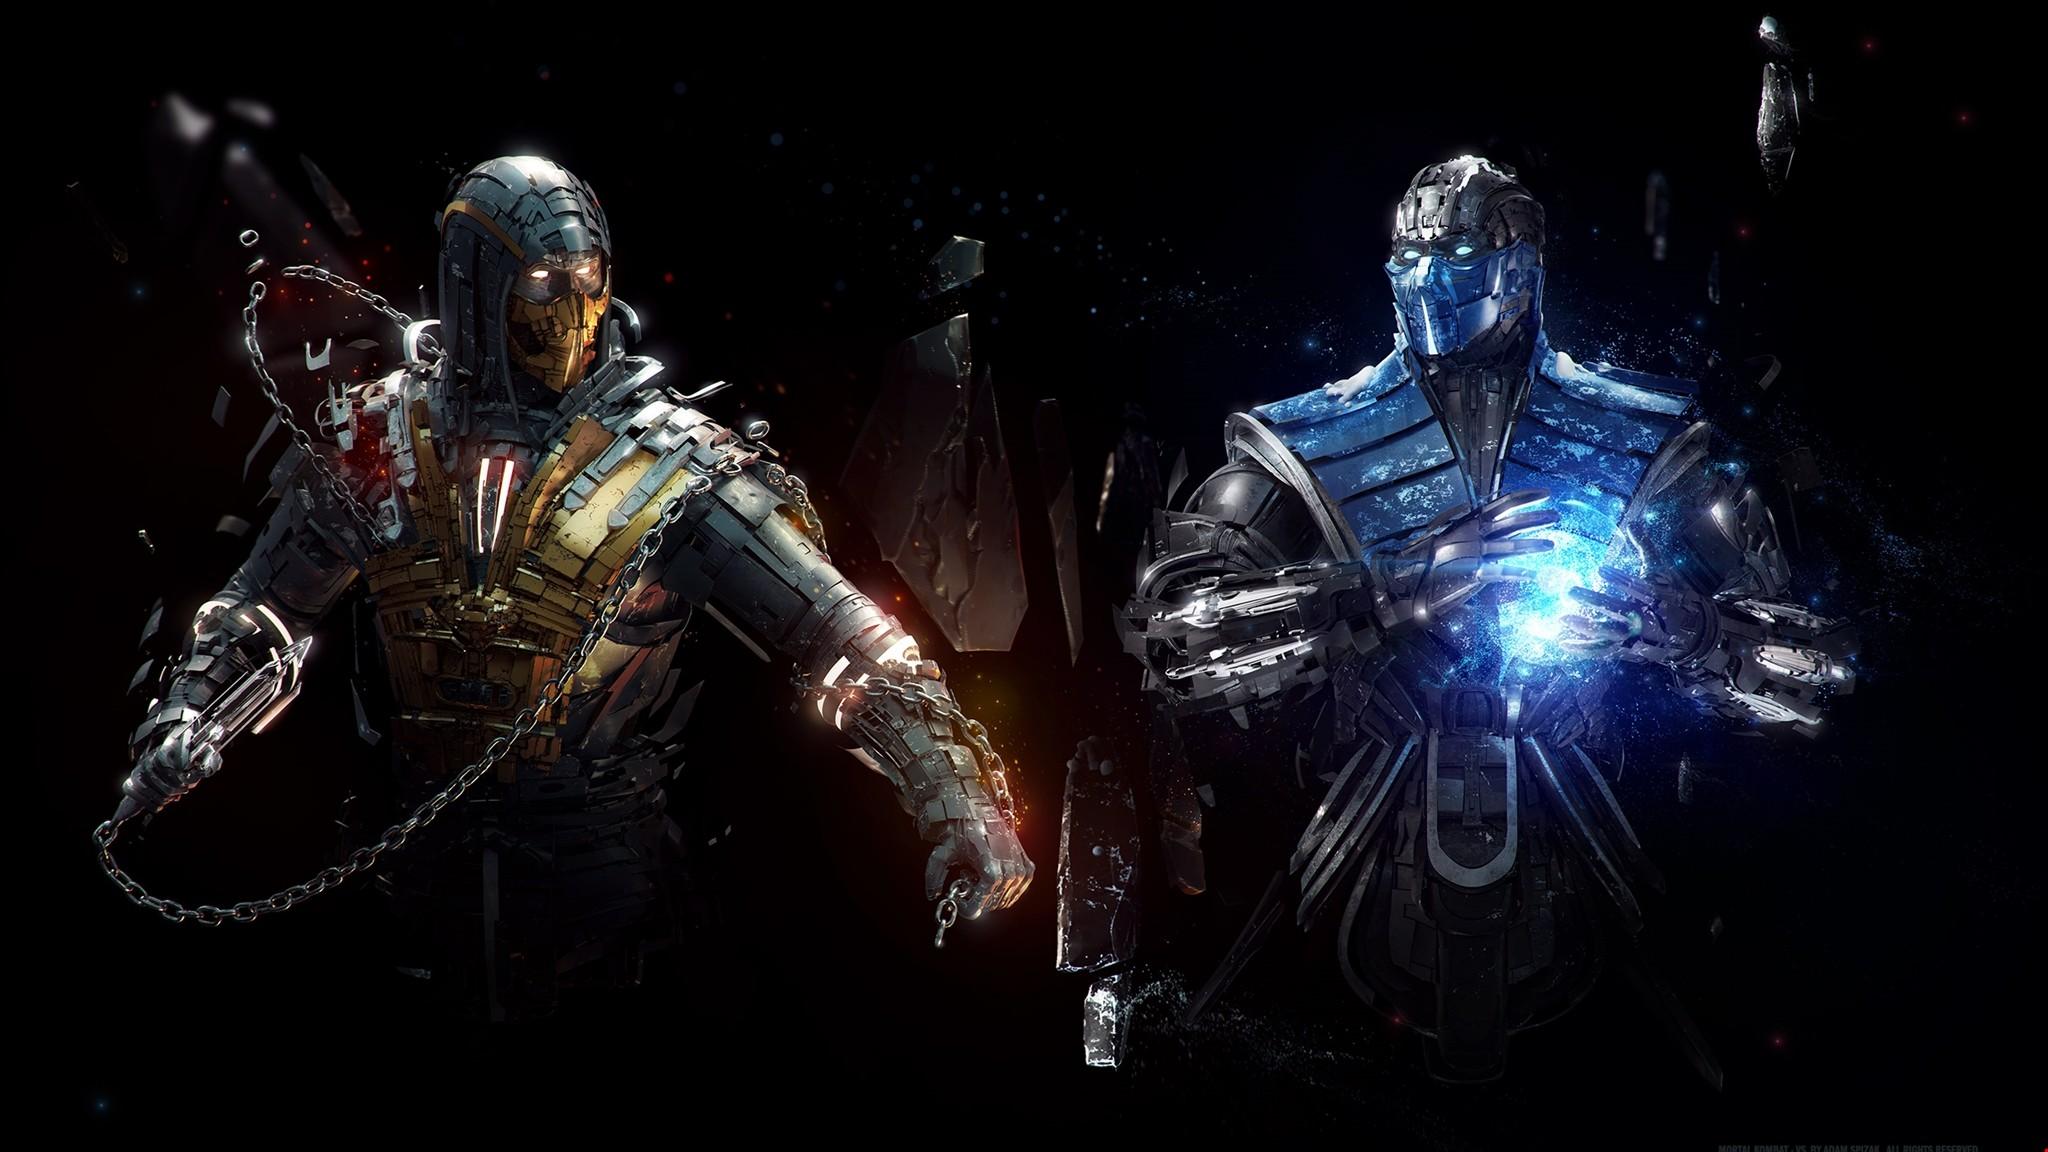 Res: 2048x1152, Download 2k Sub Zero Vs Scorpion Mortal Kombat - Games Wallpapers HD